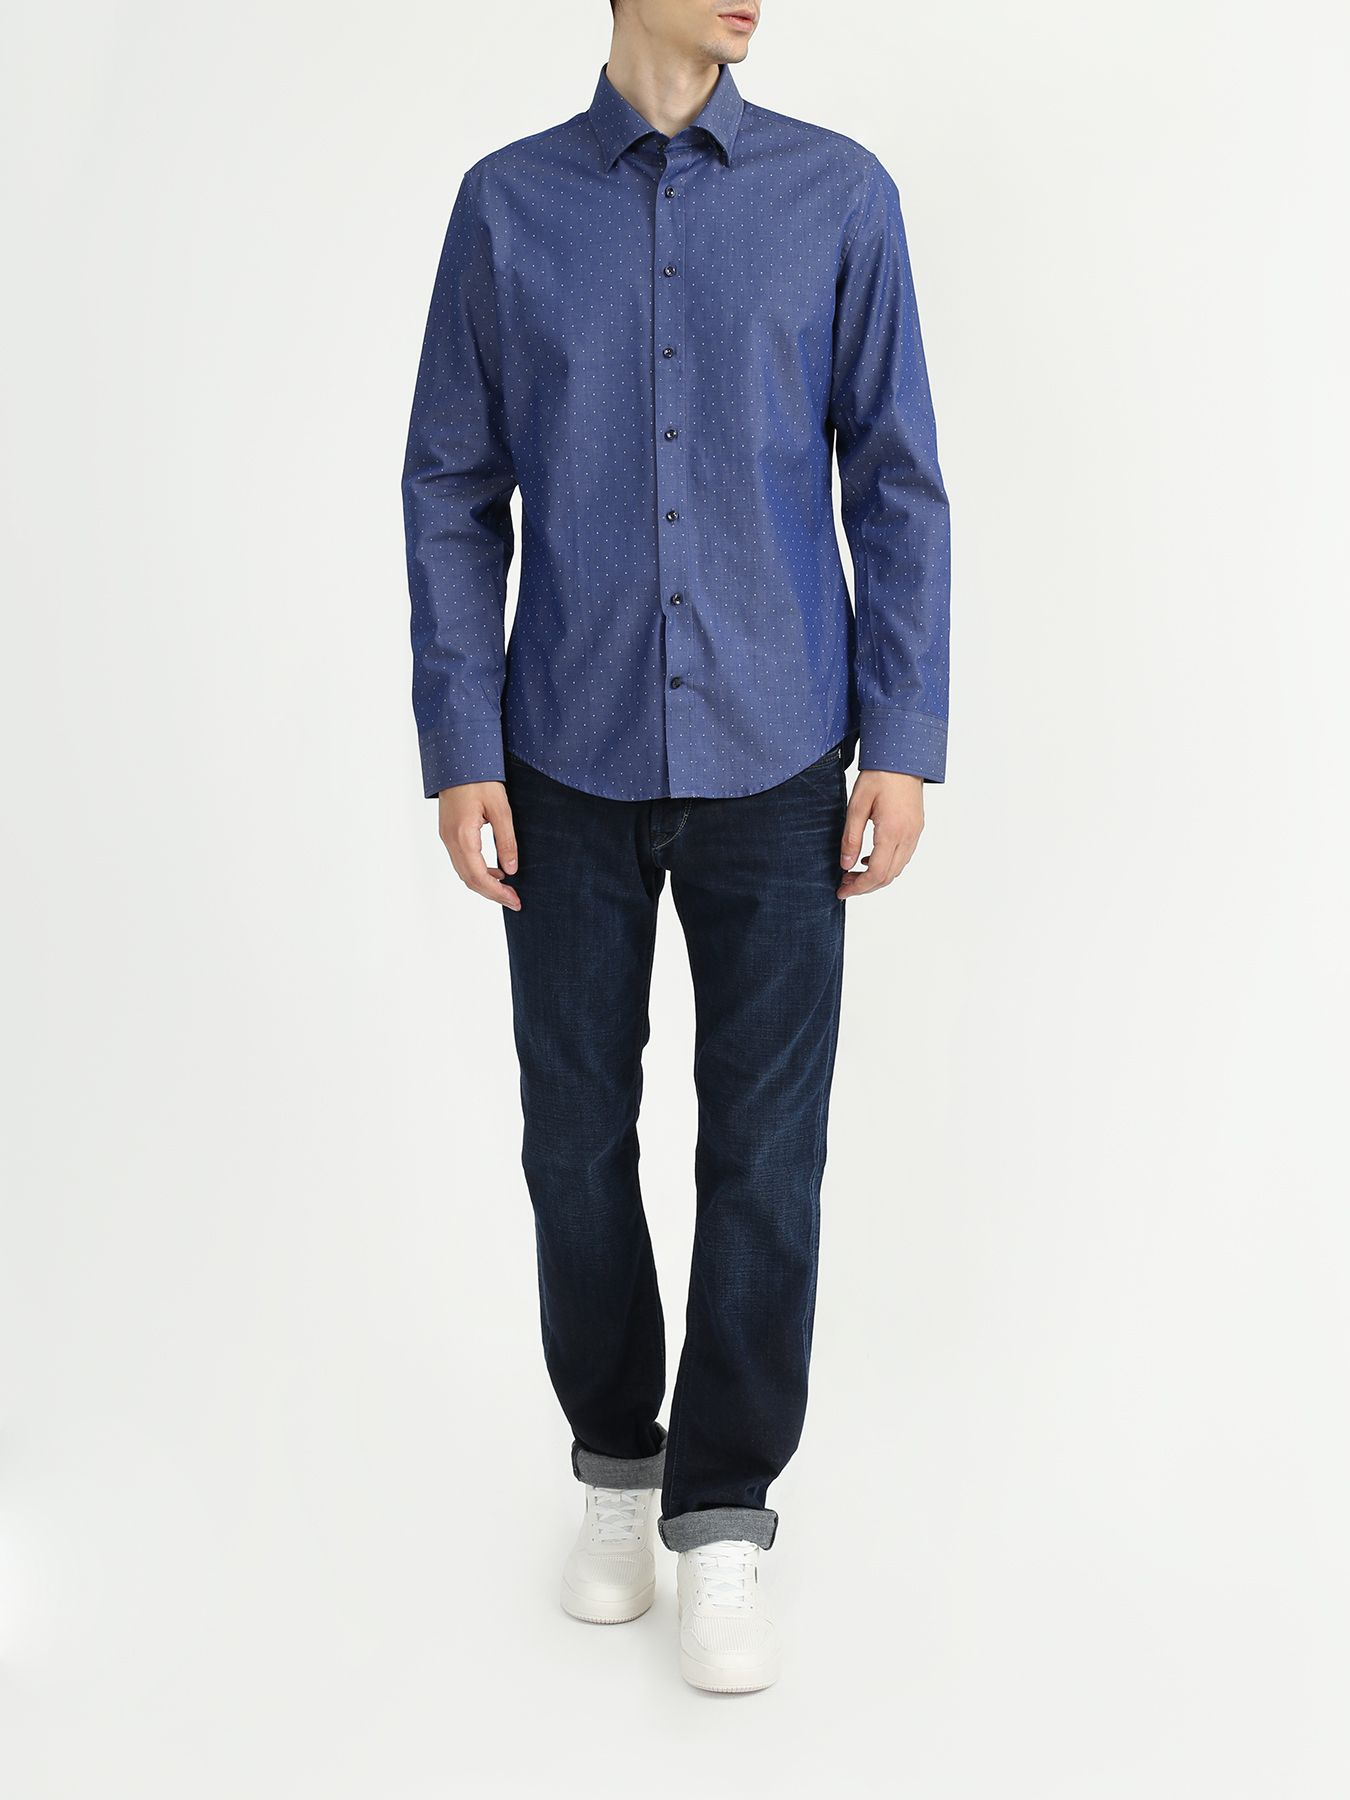 Рубашка Seidensticker Рубашка с длинным рукавом